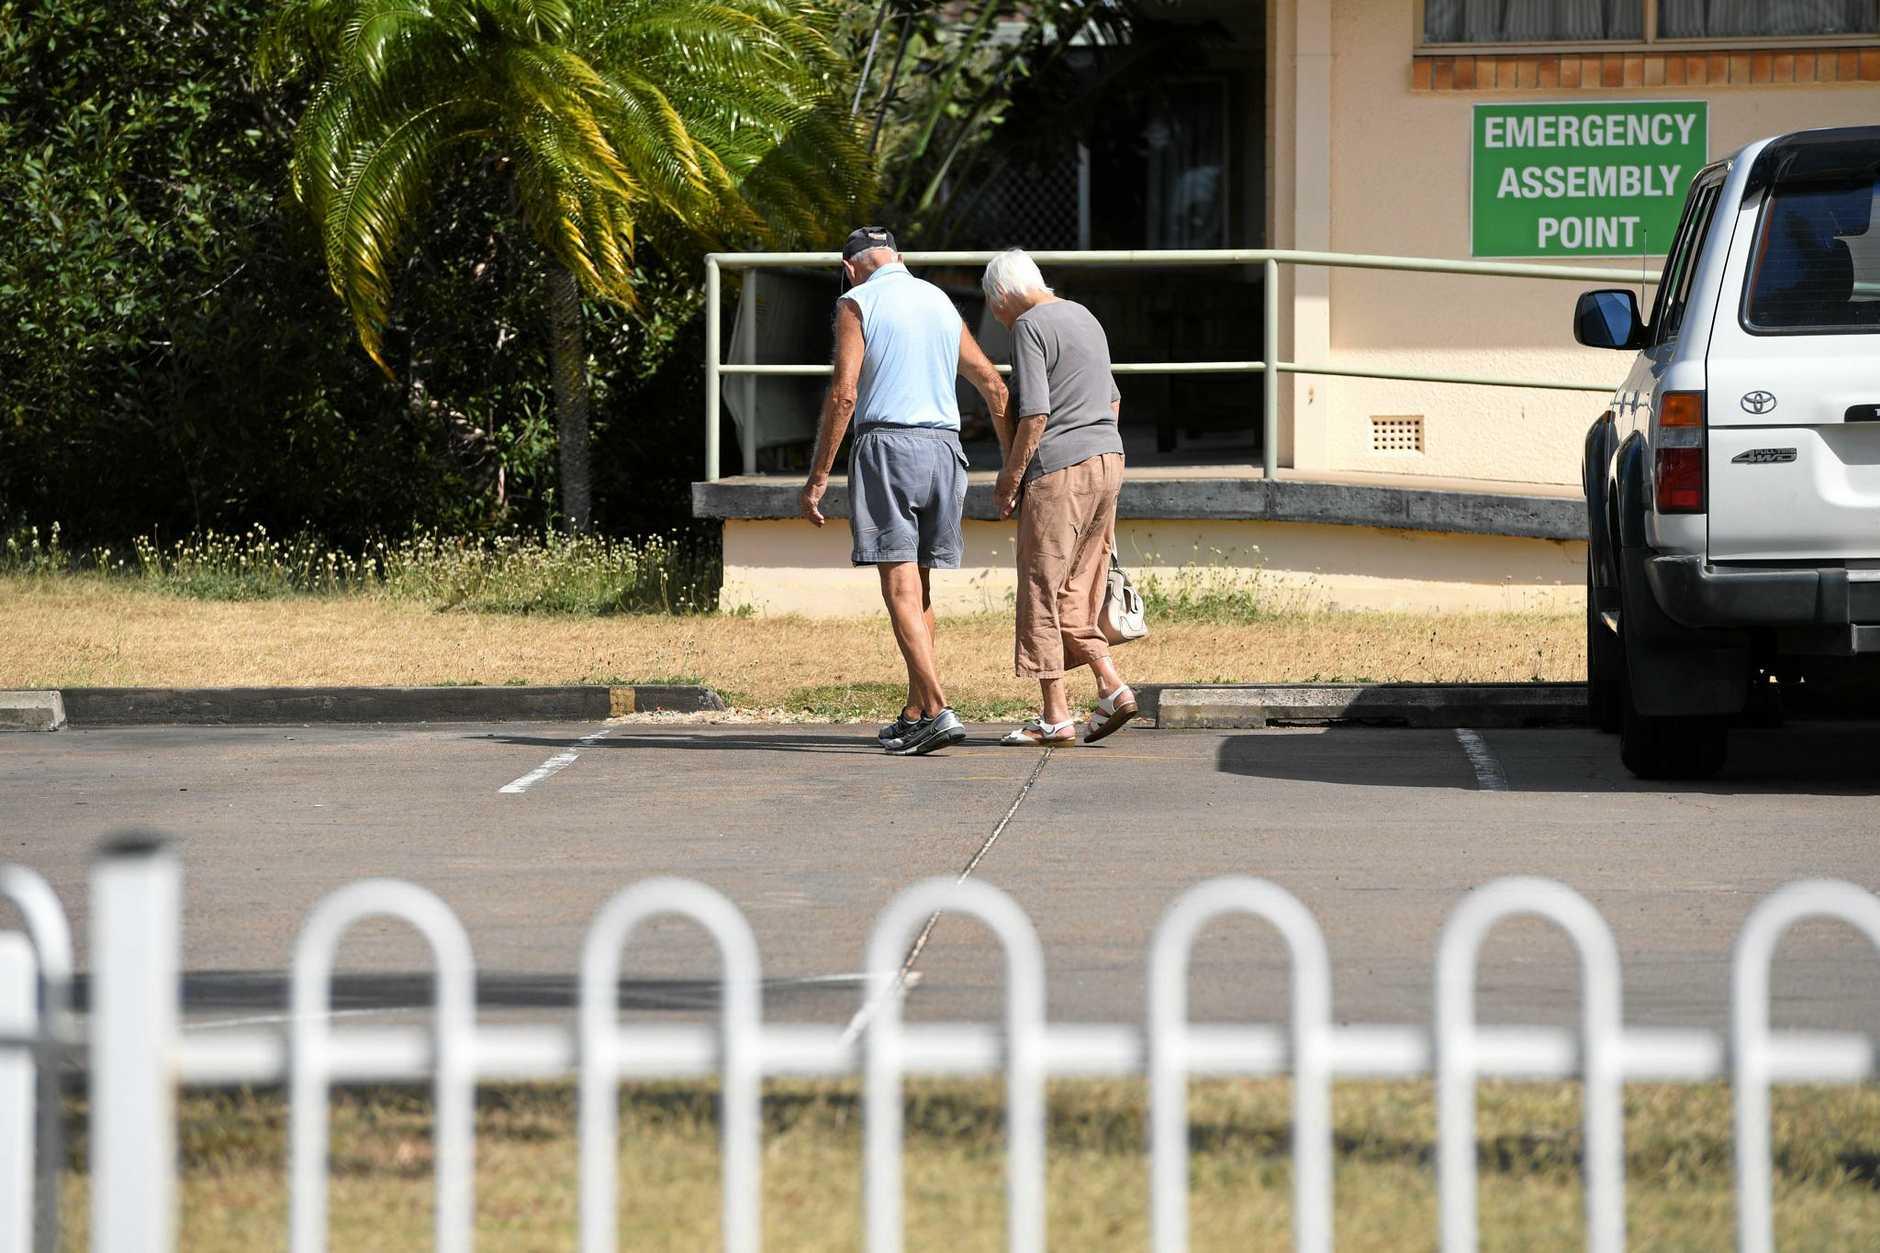 TriCare Bundaberg Aged Care Residence.